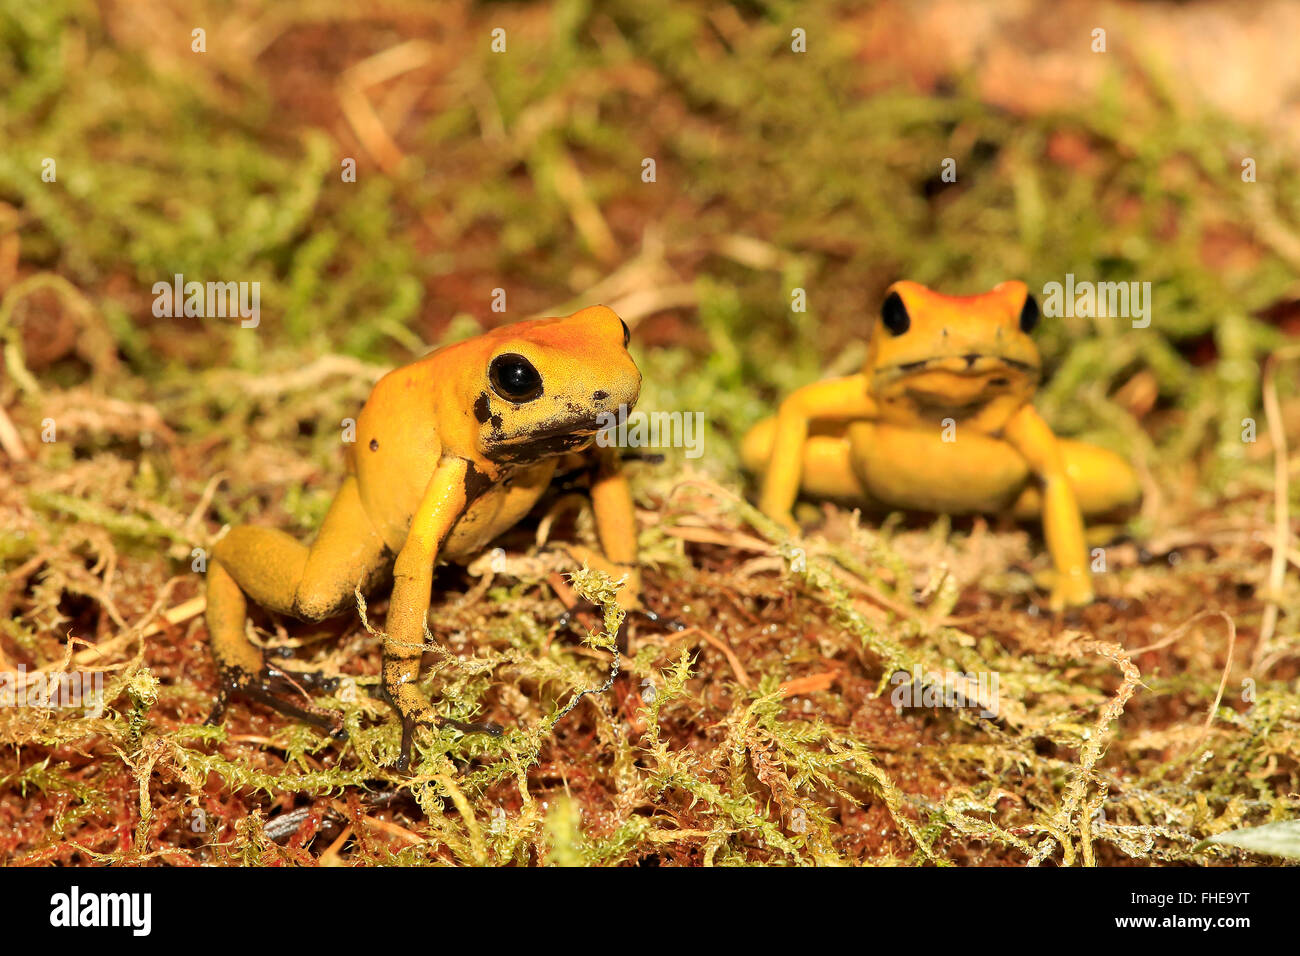 Black Legged Dart Frog, South America / (Phyllobates bicolor) - Stock Image